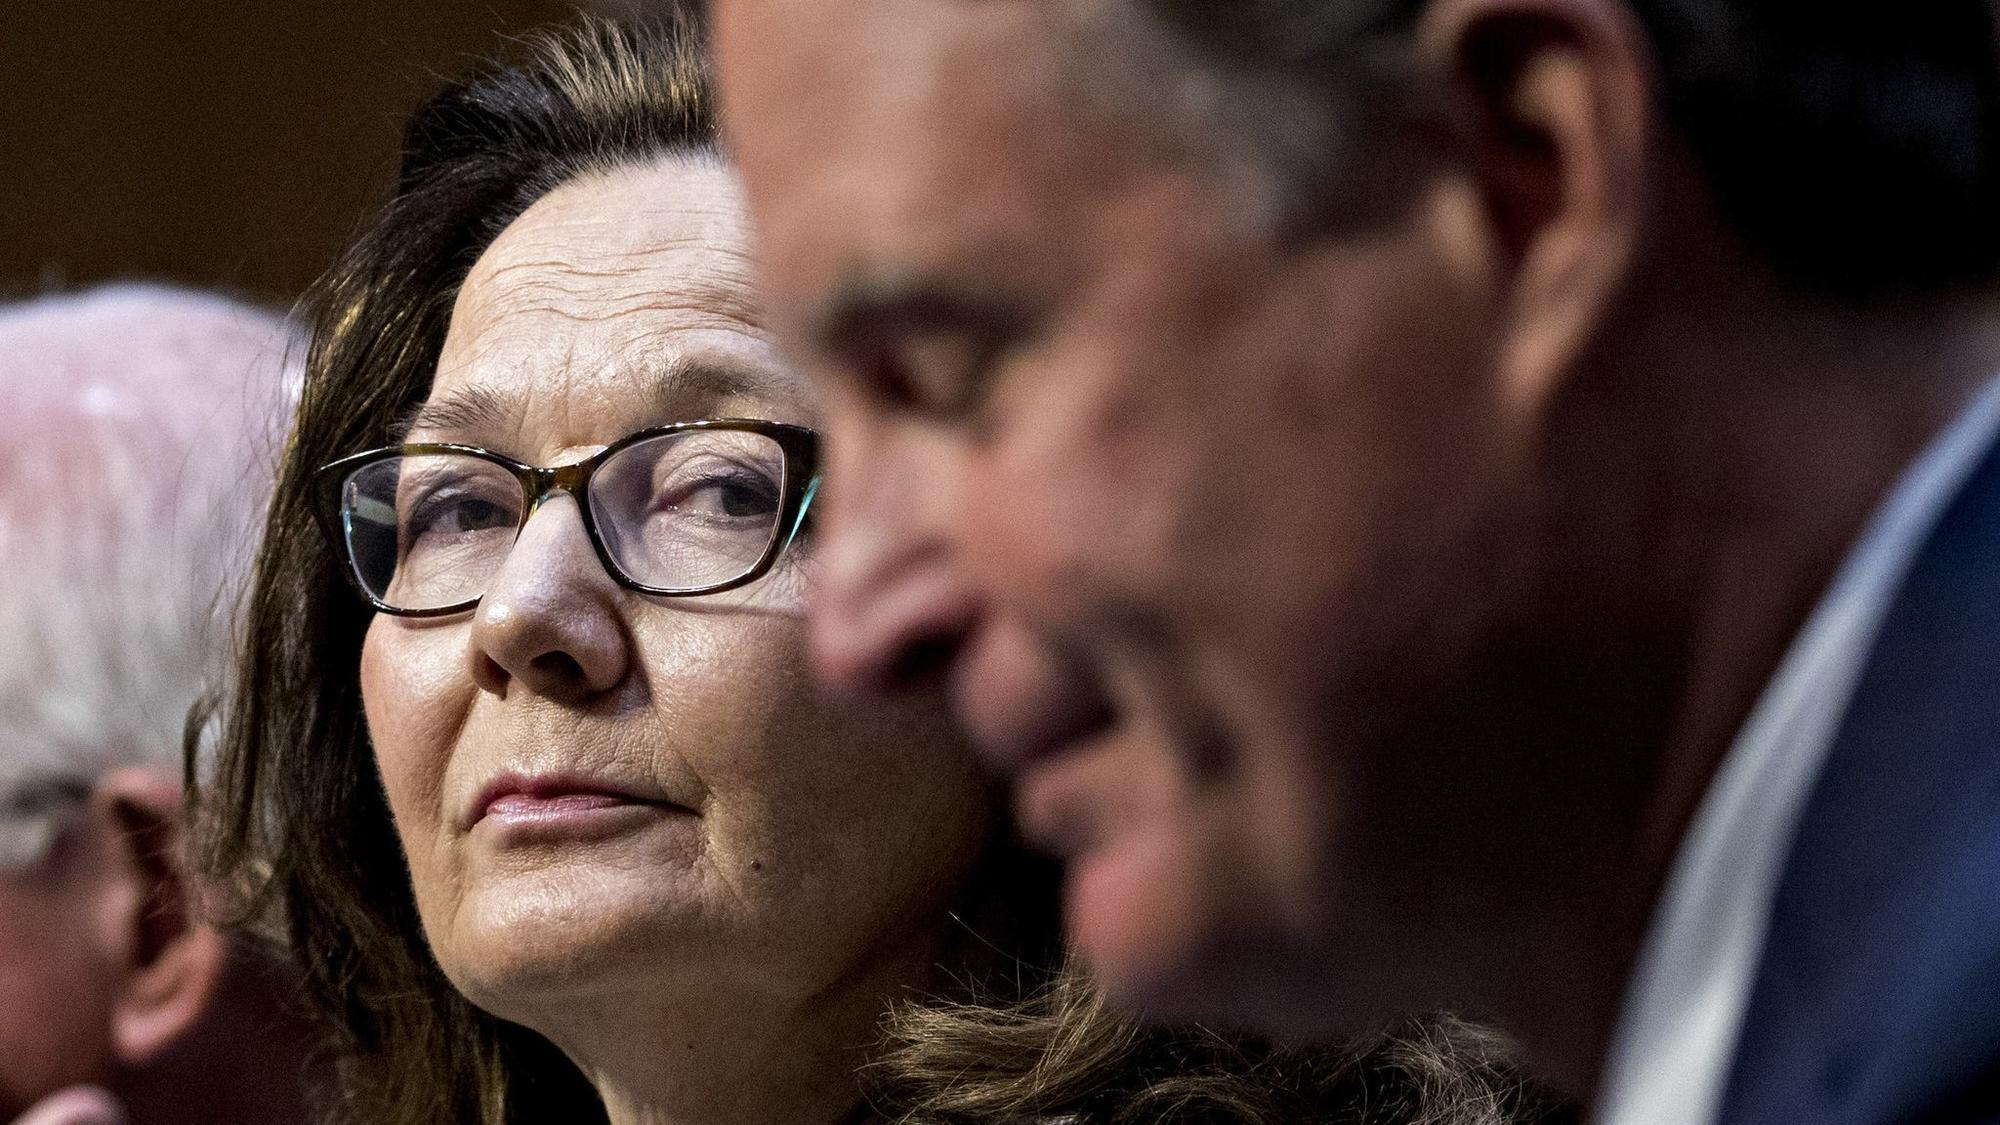 Haspel's torture record violates American values